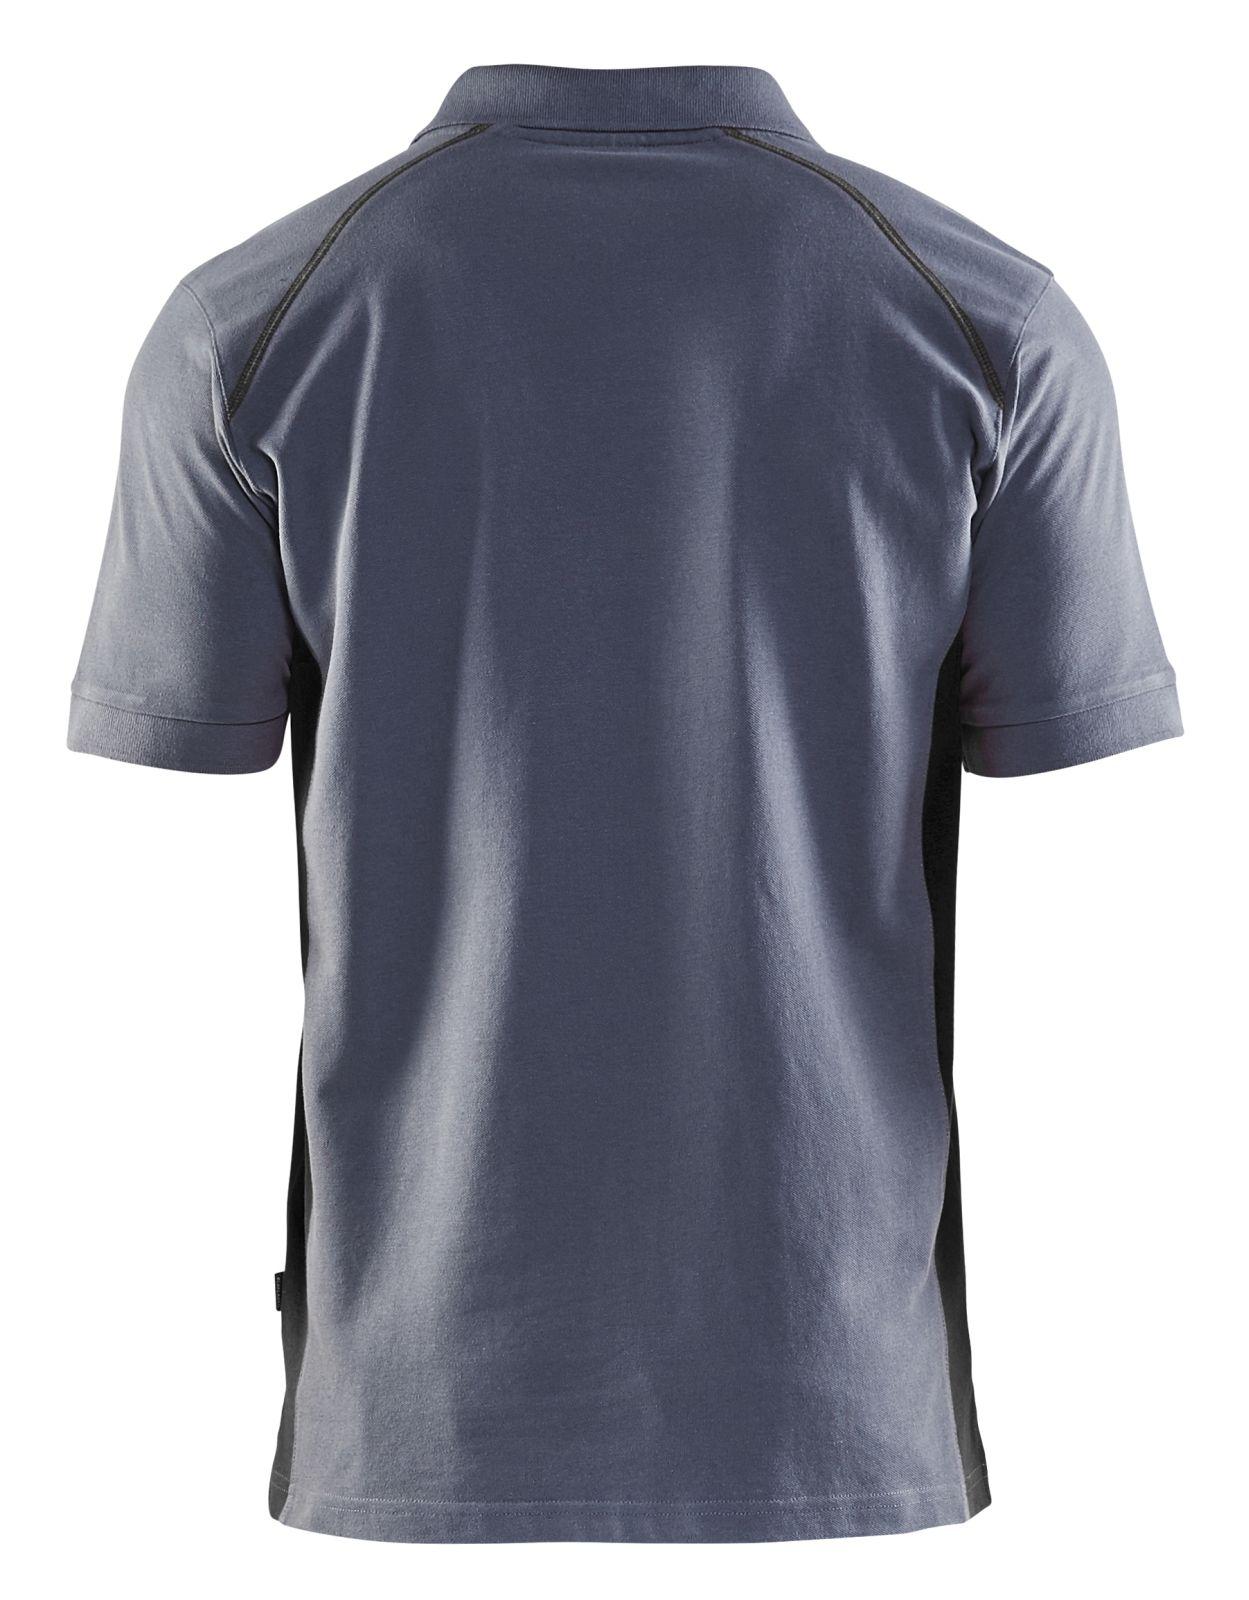 Blaklader Polo shirts 33241050 grijs-zwart(9499)